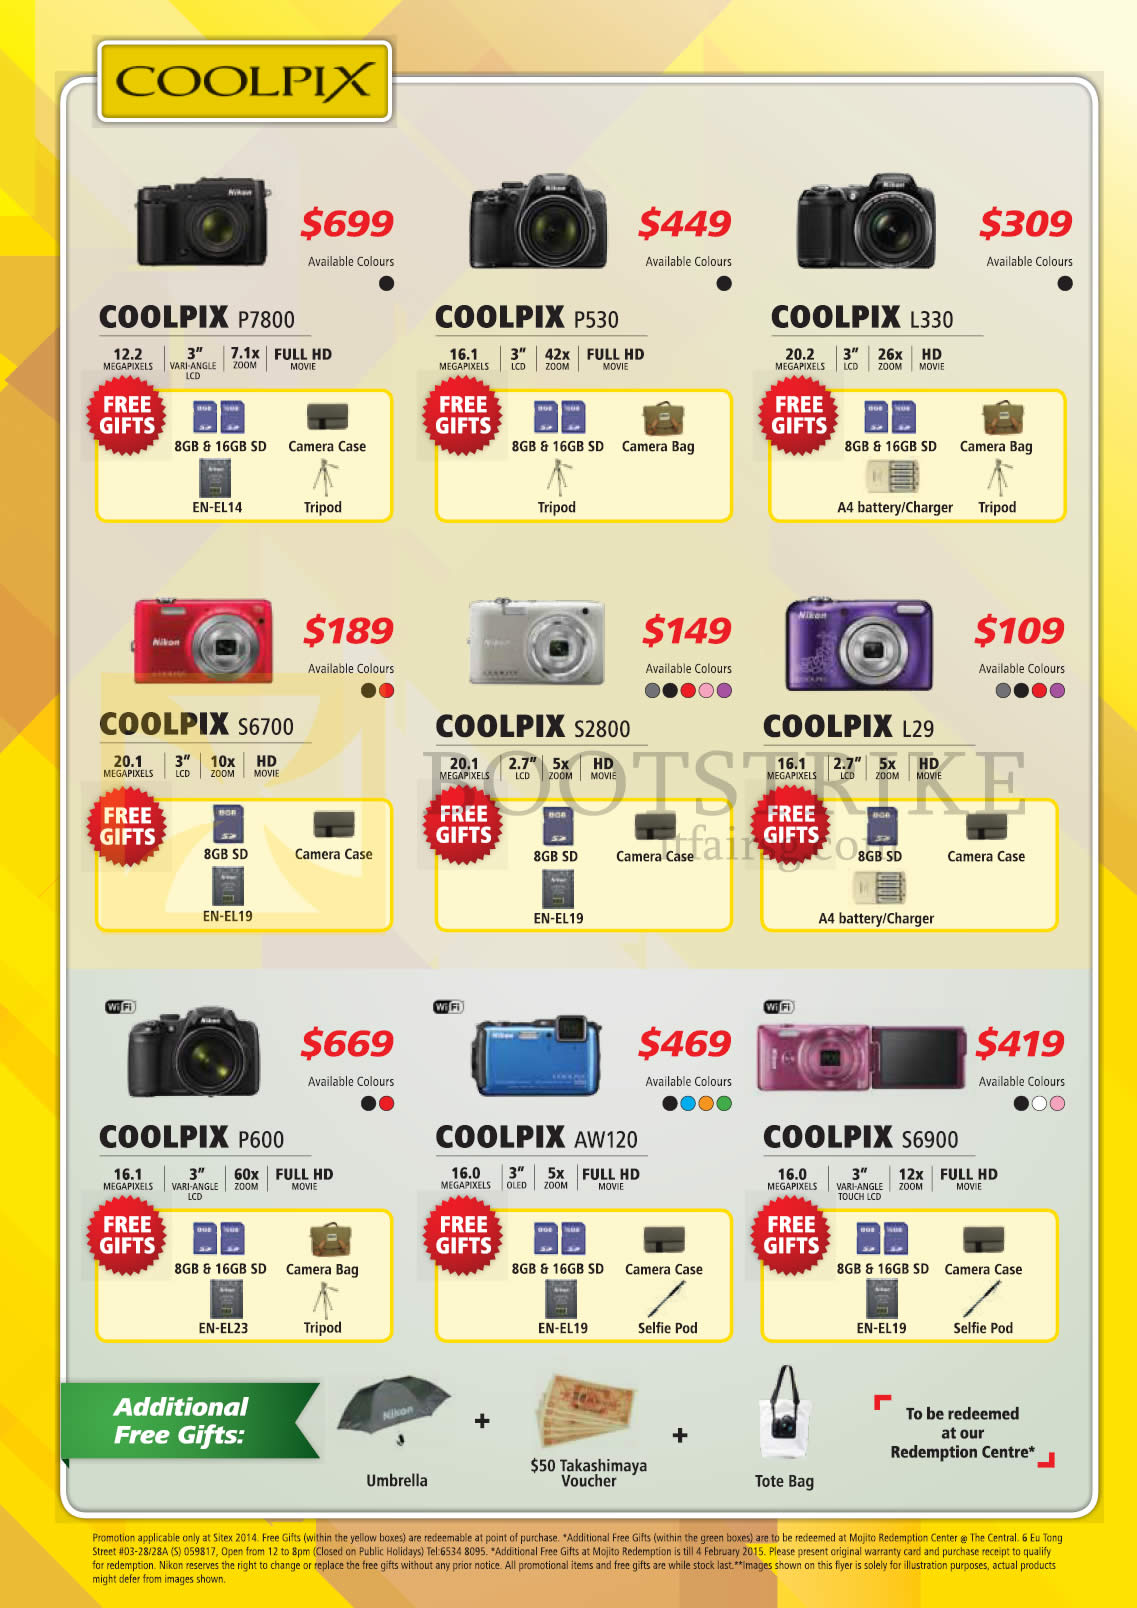 Nikon Digital Cameras 1 AW1, 1 J4